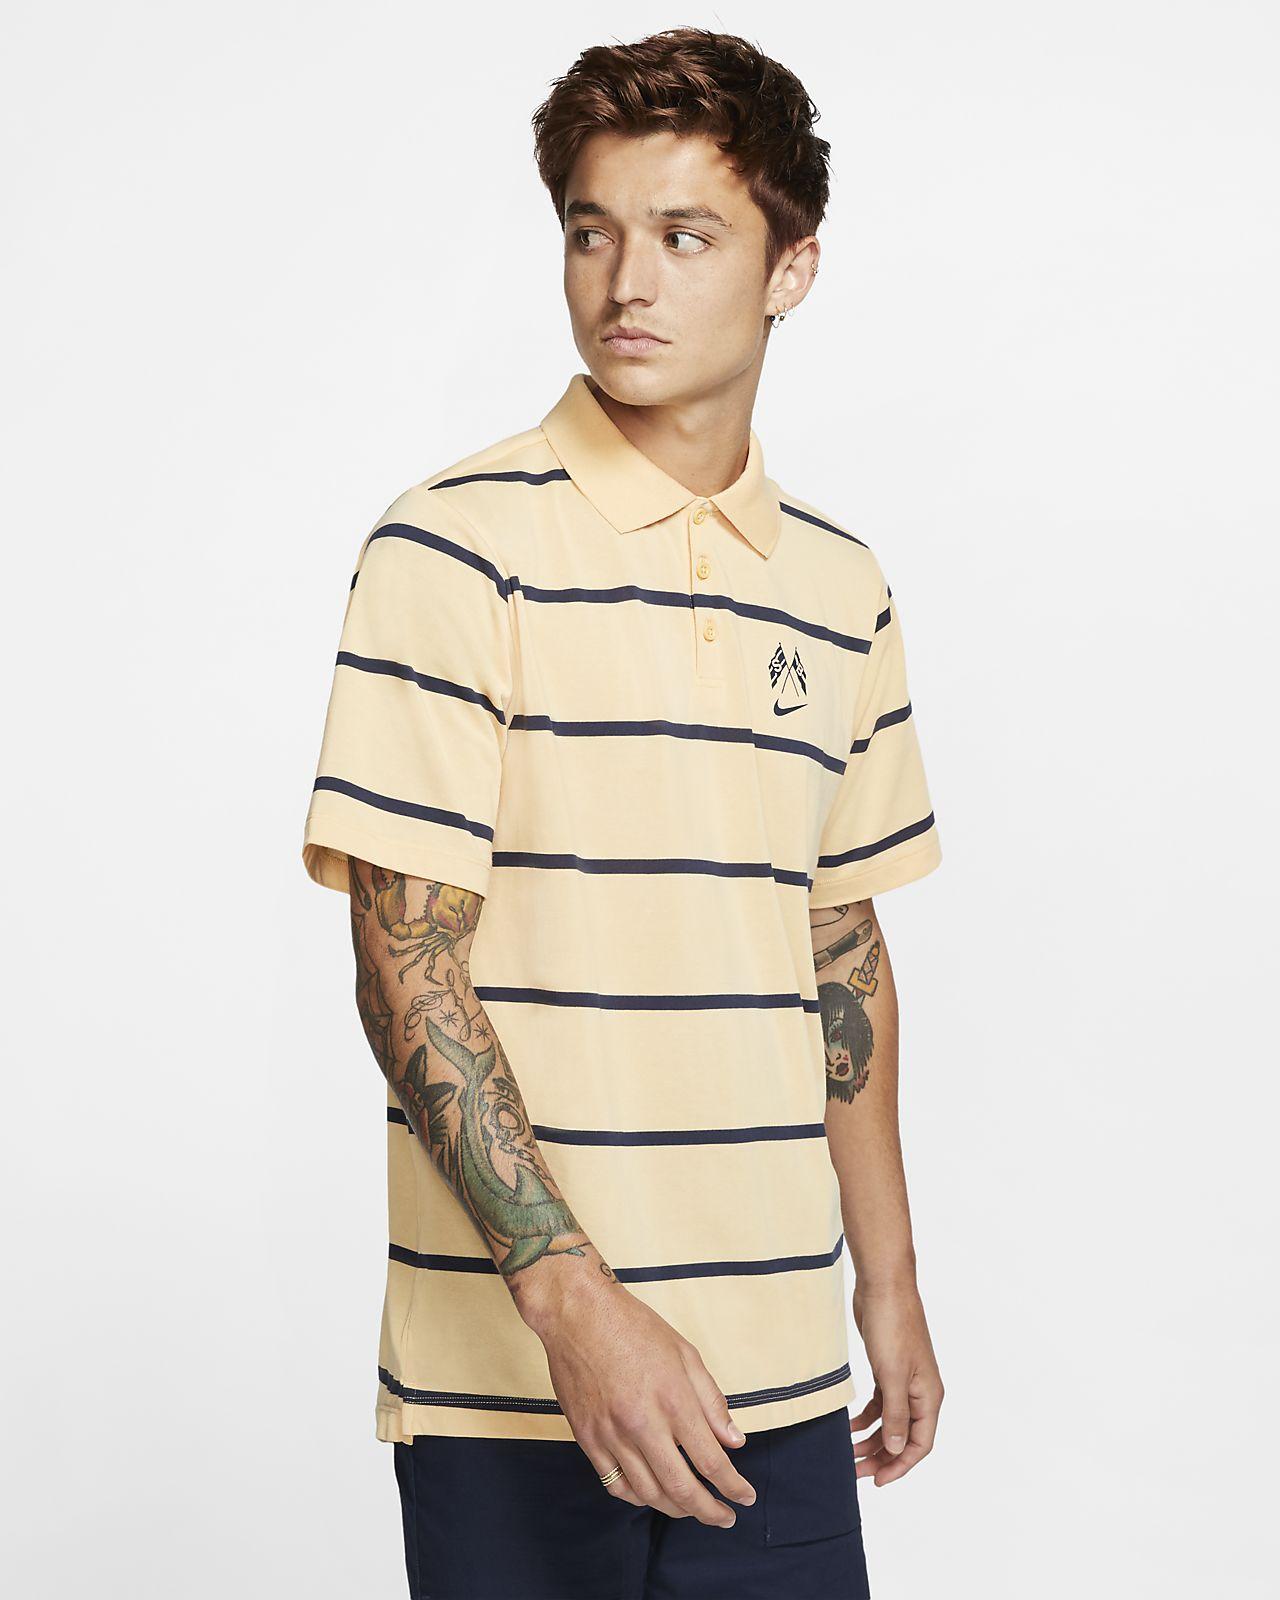 Nike SB Dri-FIT Polo de skateboard - Hombre